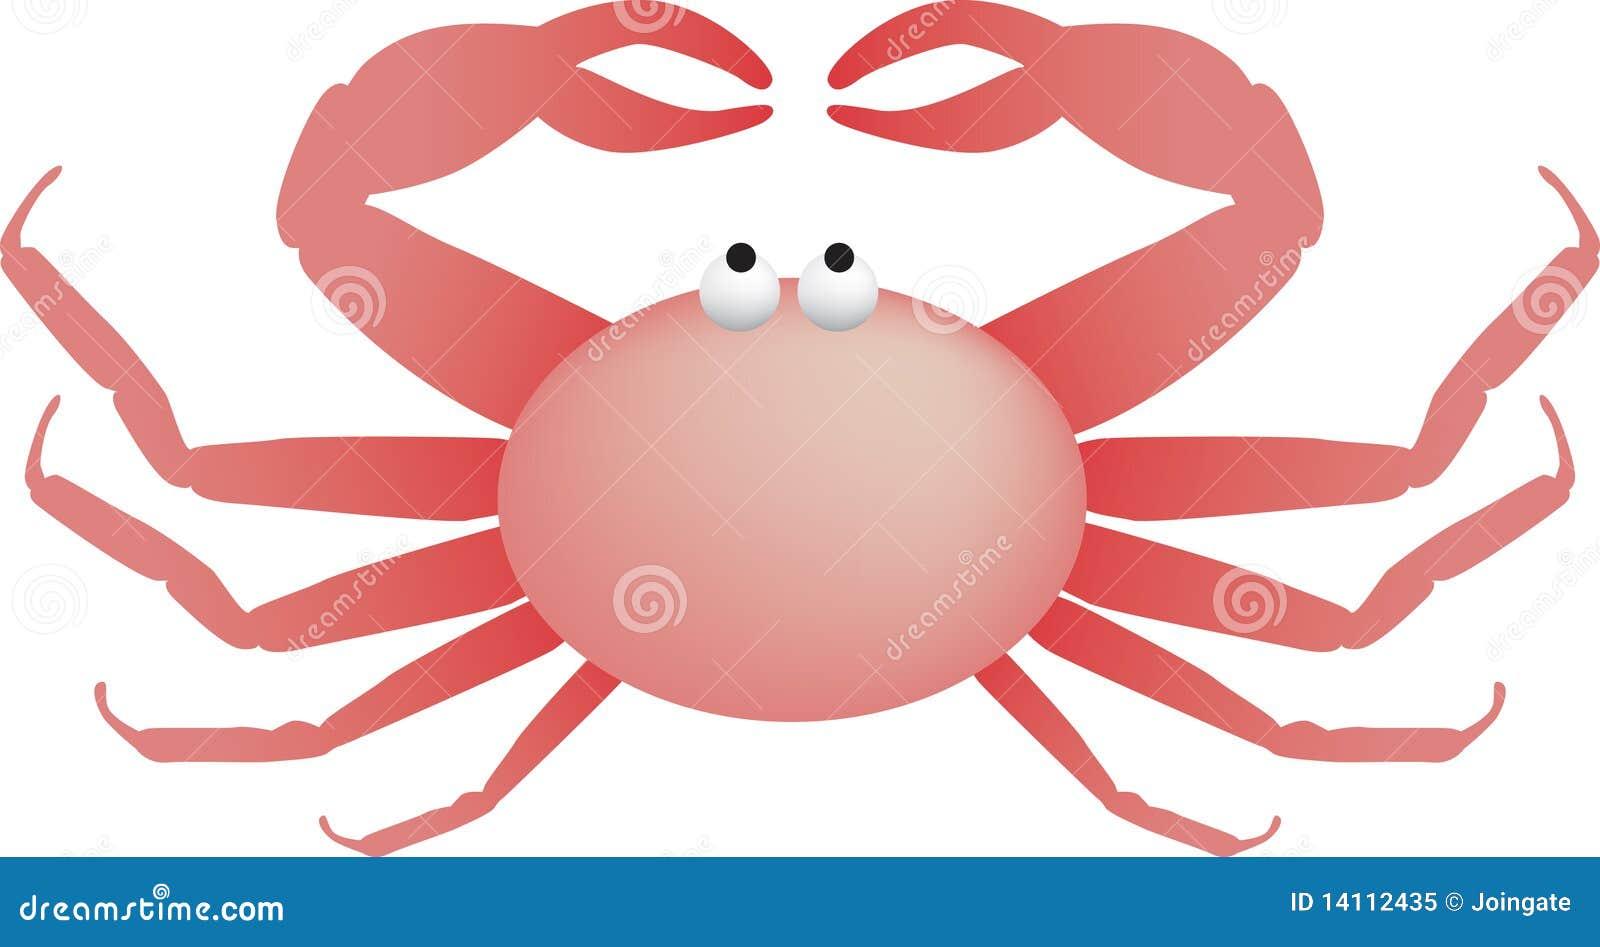 king crab clipart - photo #8